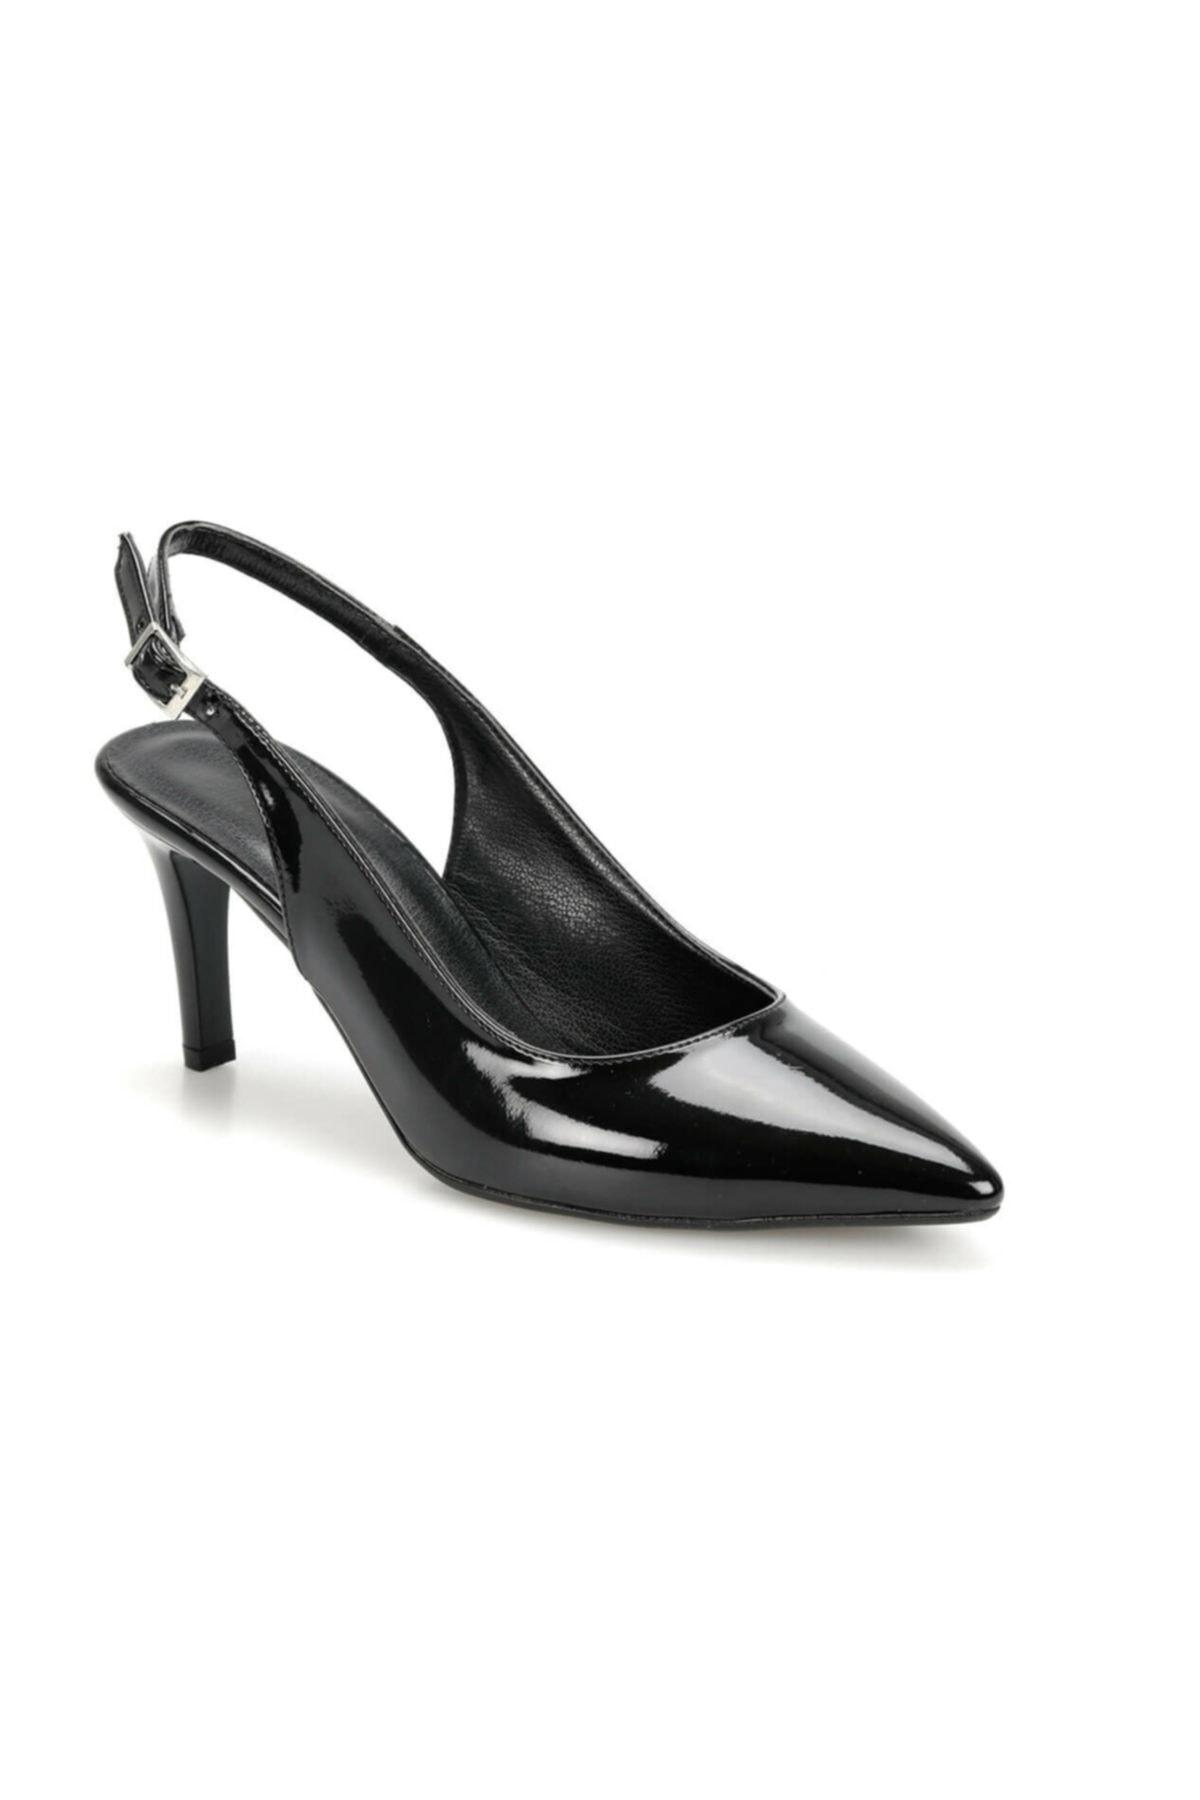 Miss F Ds19073r Siyah Kadın Topuklu Ayakkabı 100382854 1